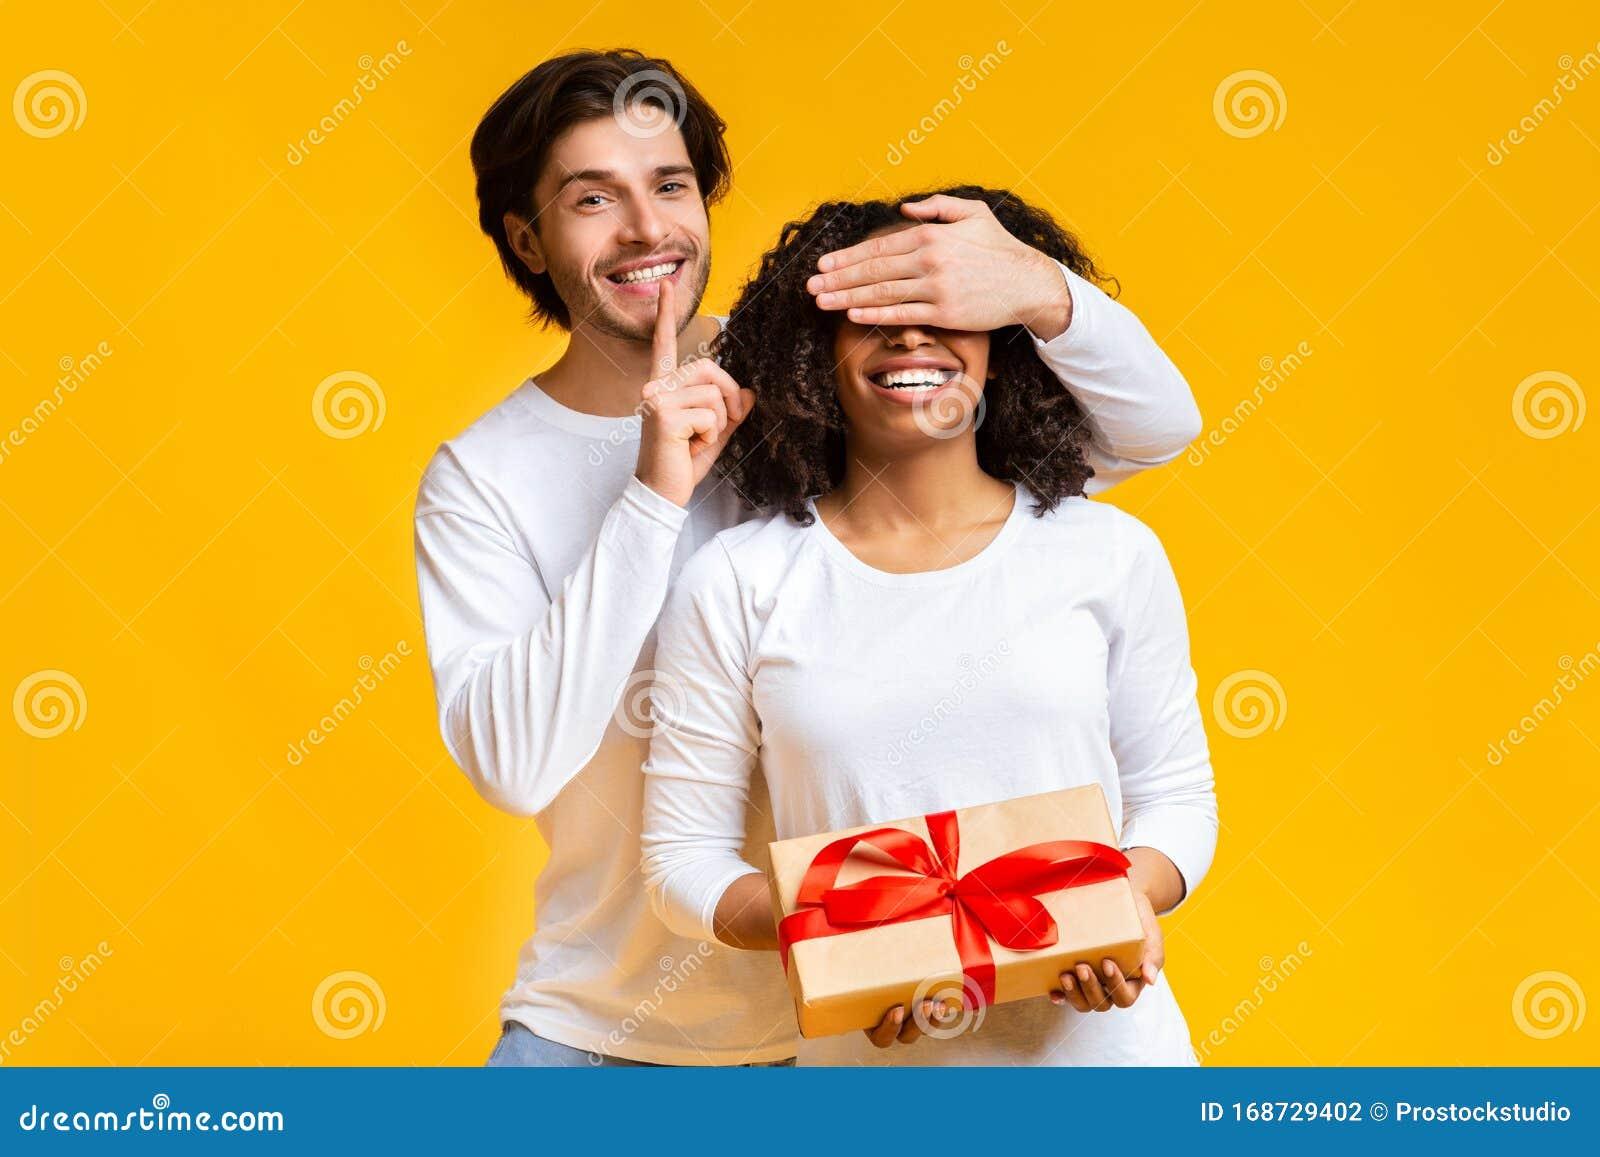 Qq international dating site